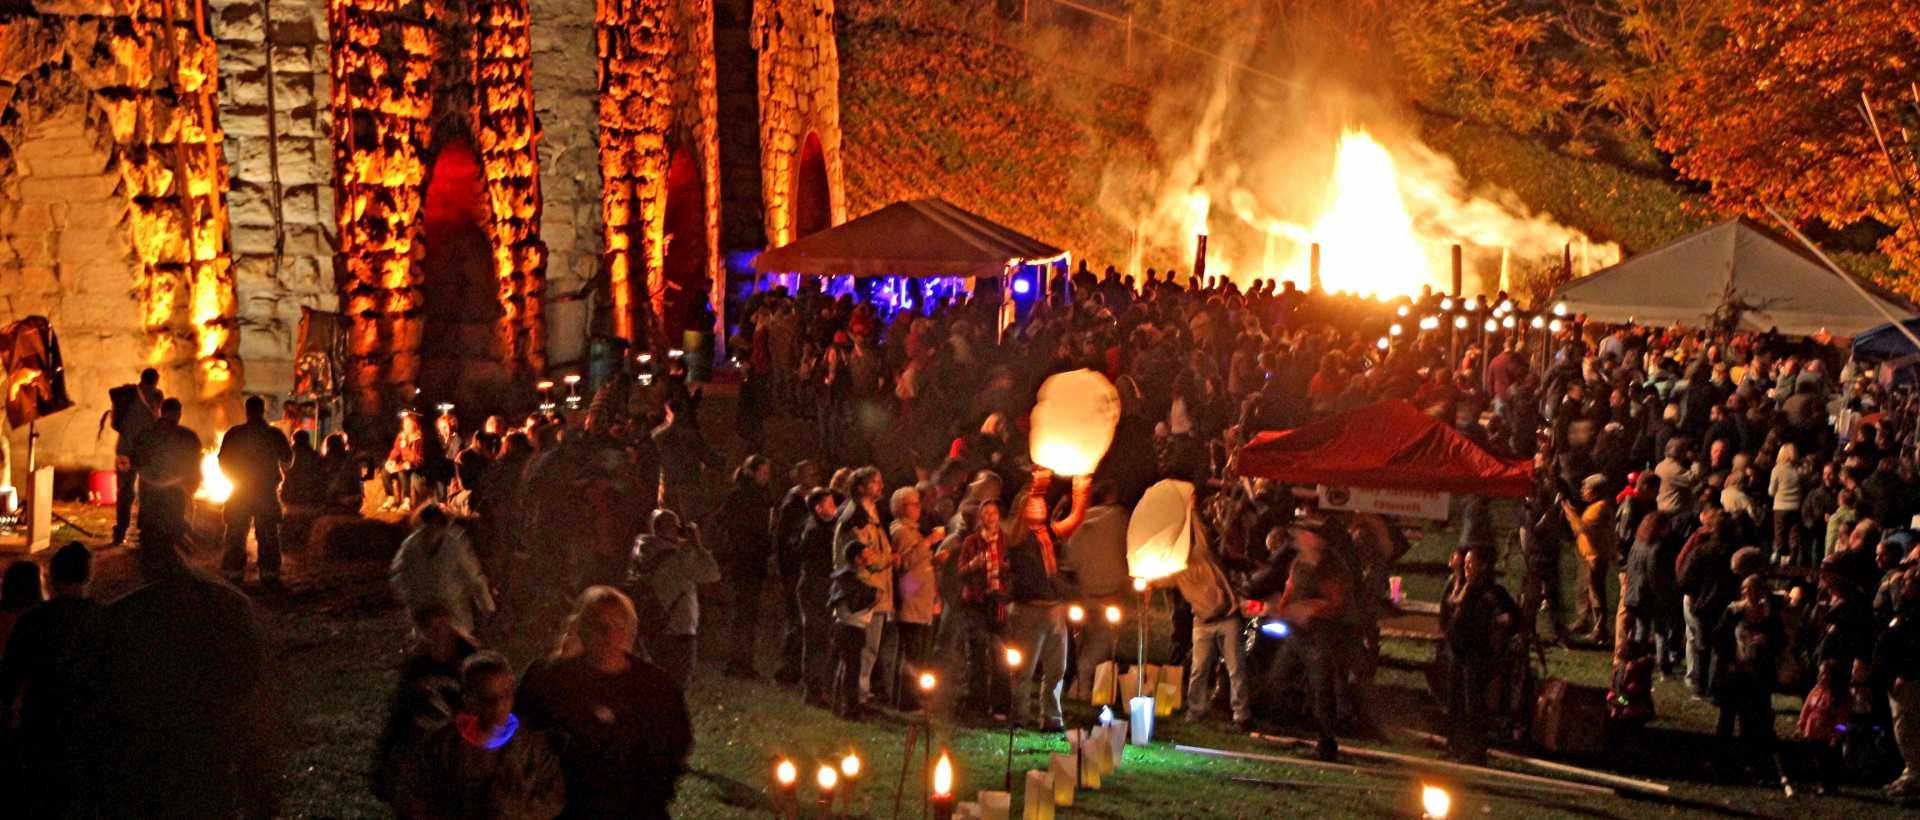 Bonfire at Iron Furnaces